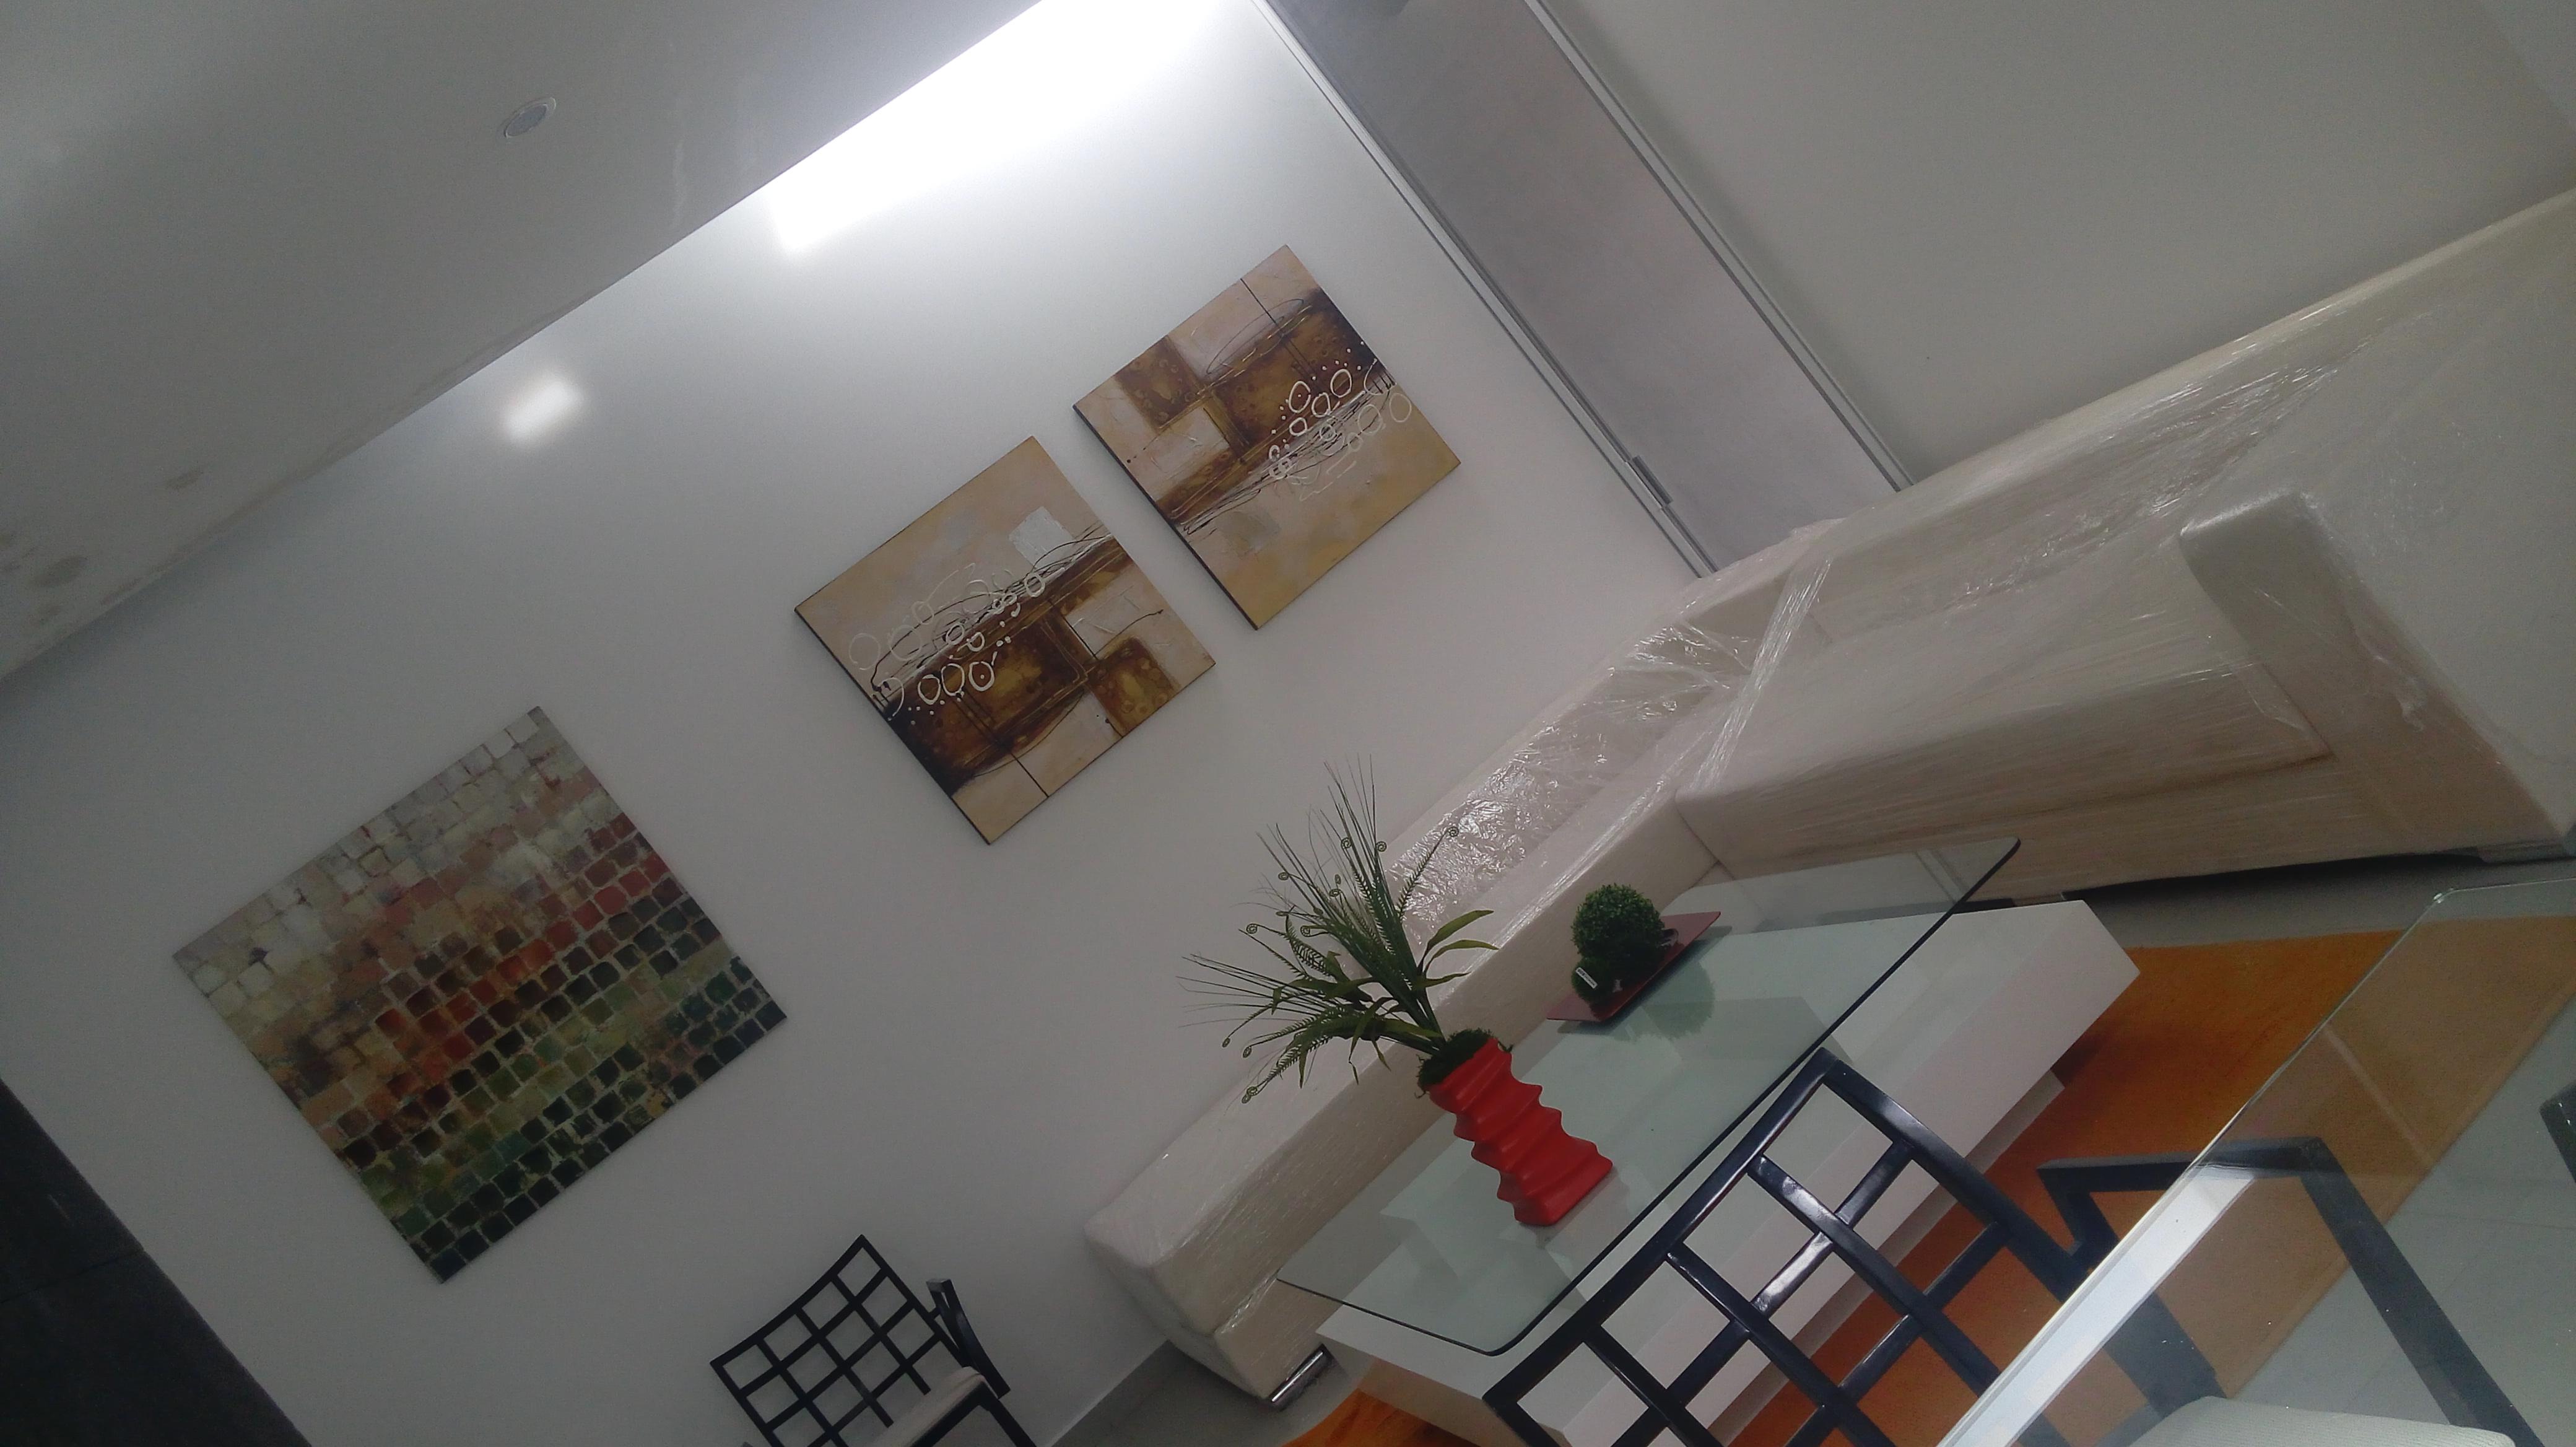 Venta de Casa en Villa Jardín 2a Sección, Aguascalientes | Goplaceit